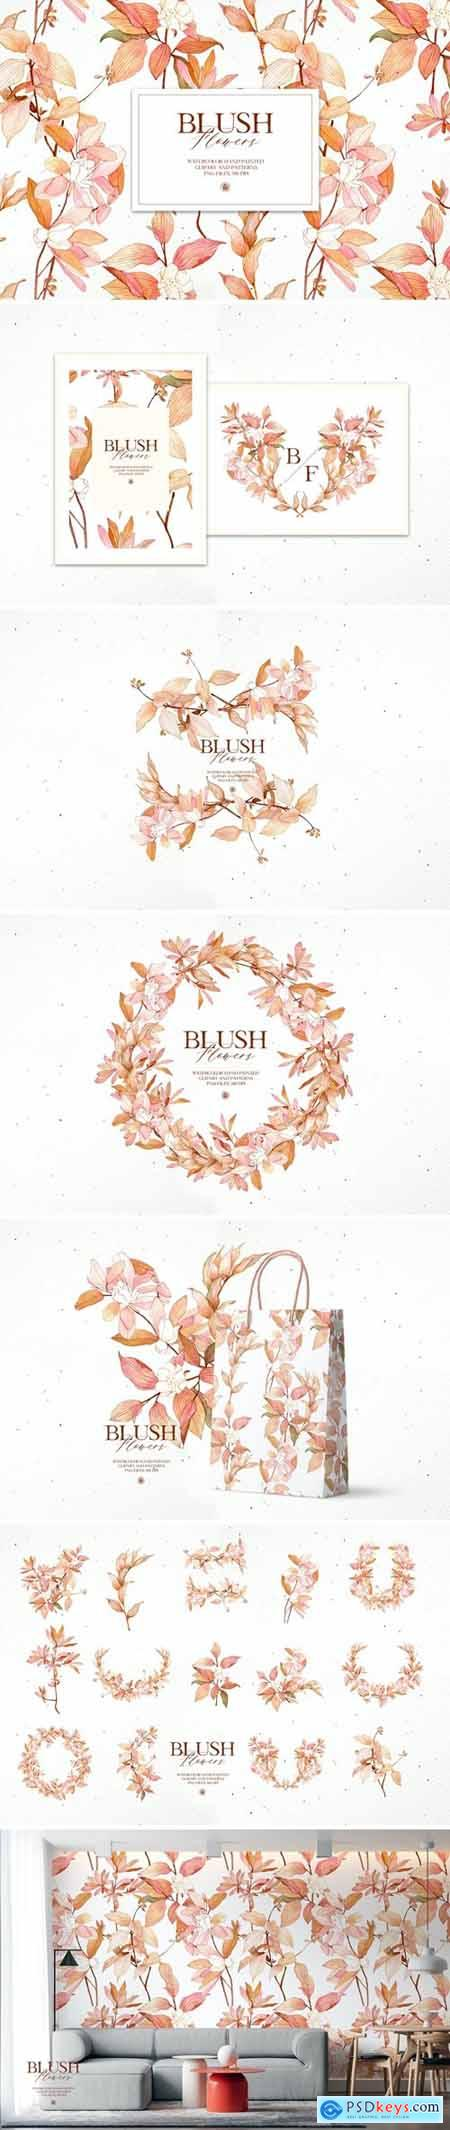 Blush Flowers- watercolor set